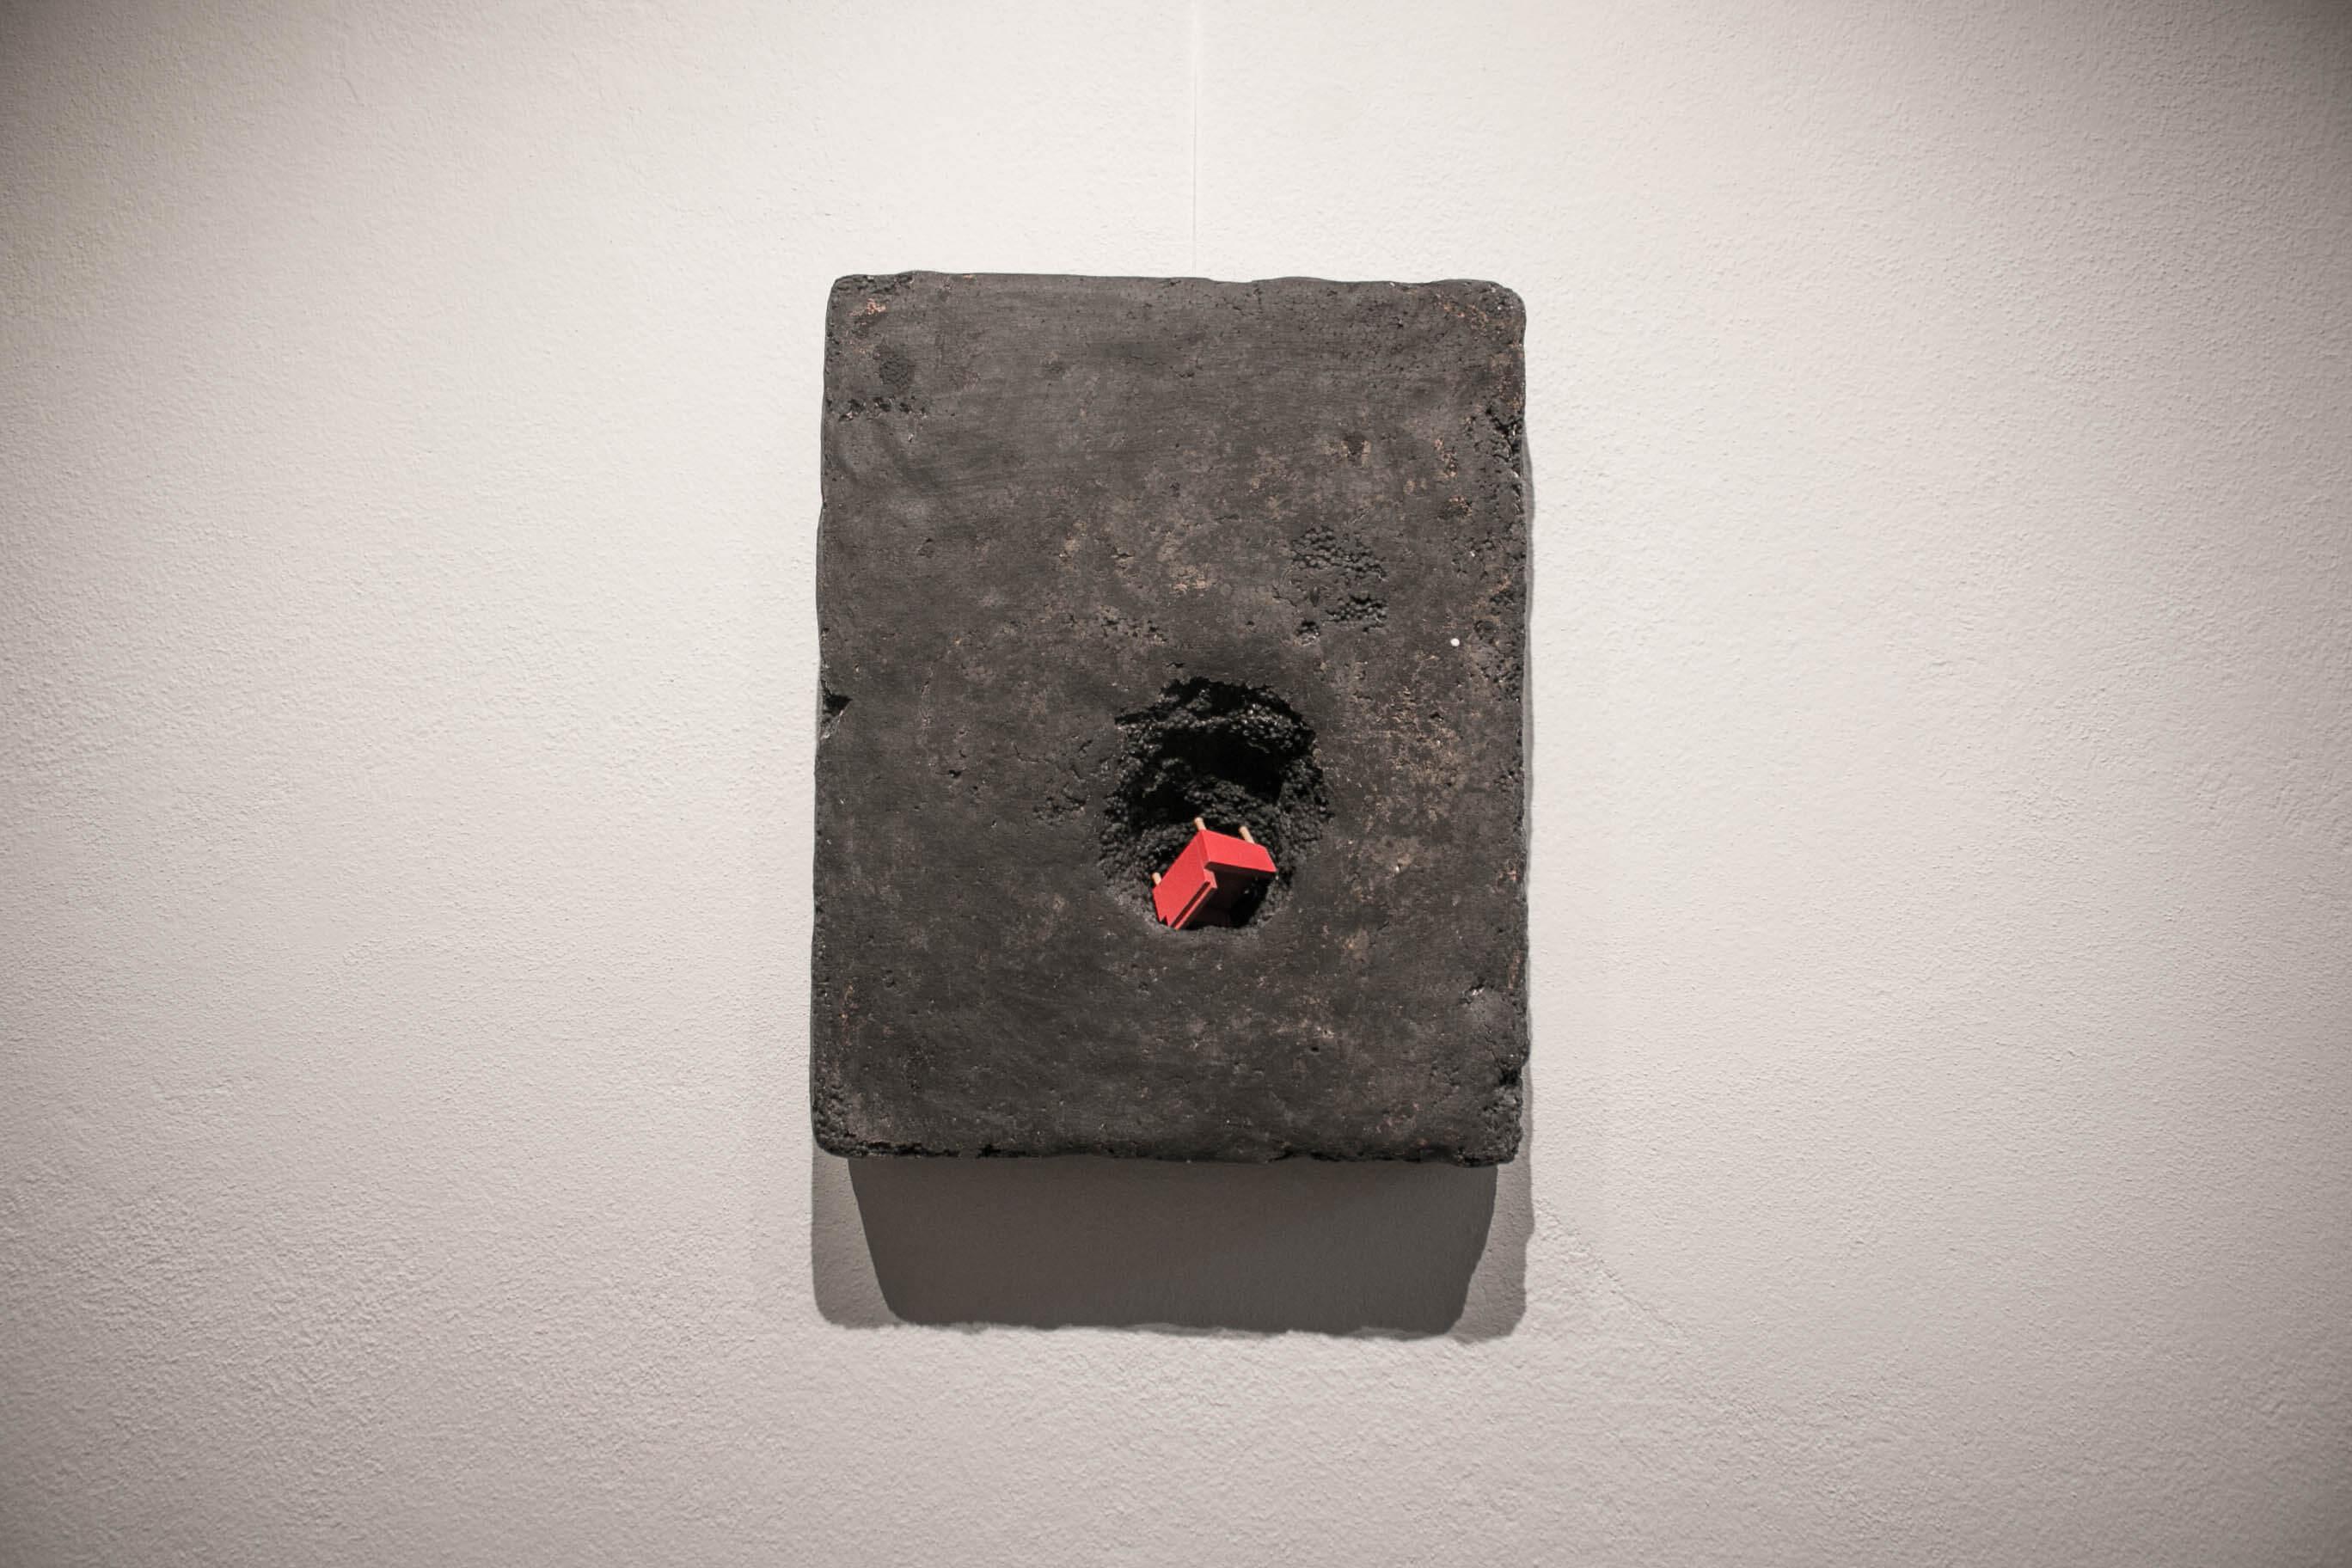 dirt_red_Meenan_art_relief_sculpture_IMG_2476.jpg